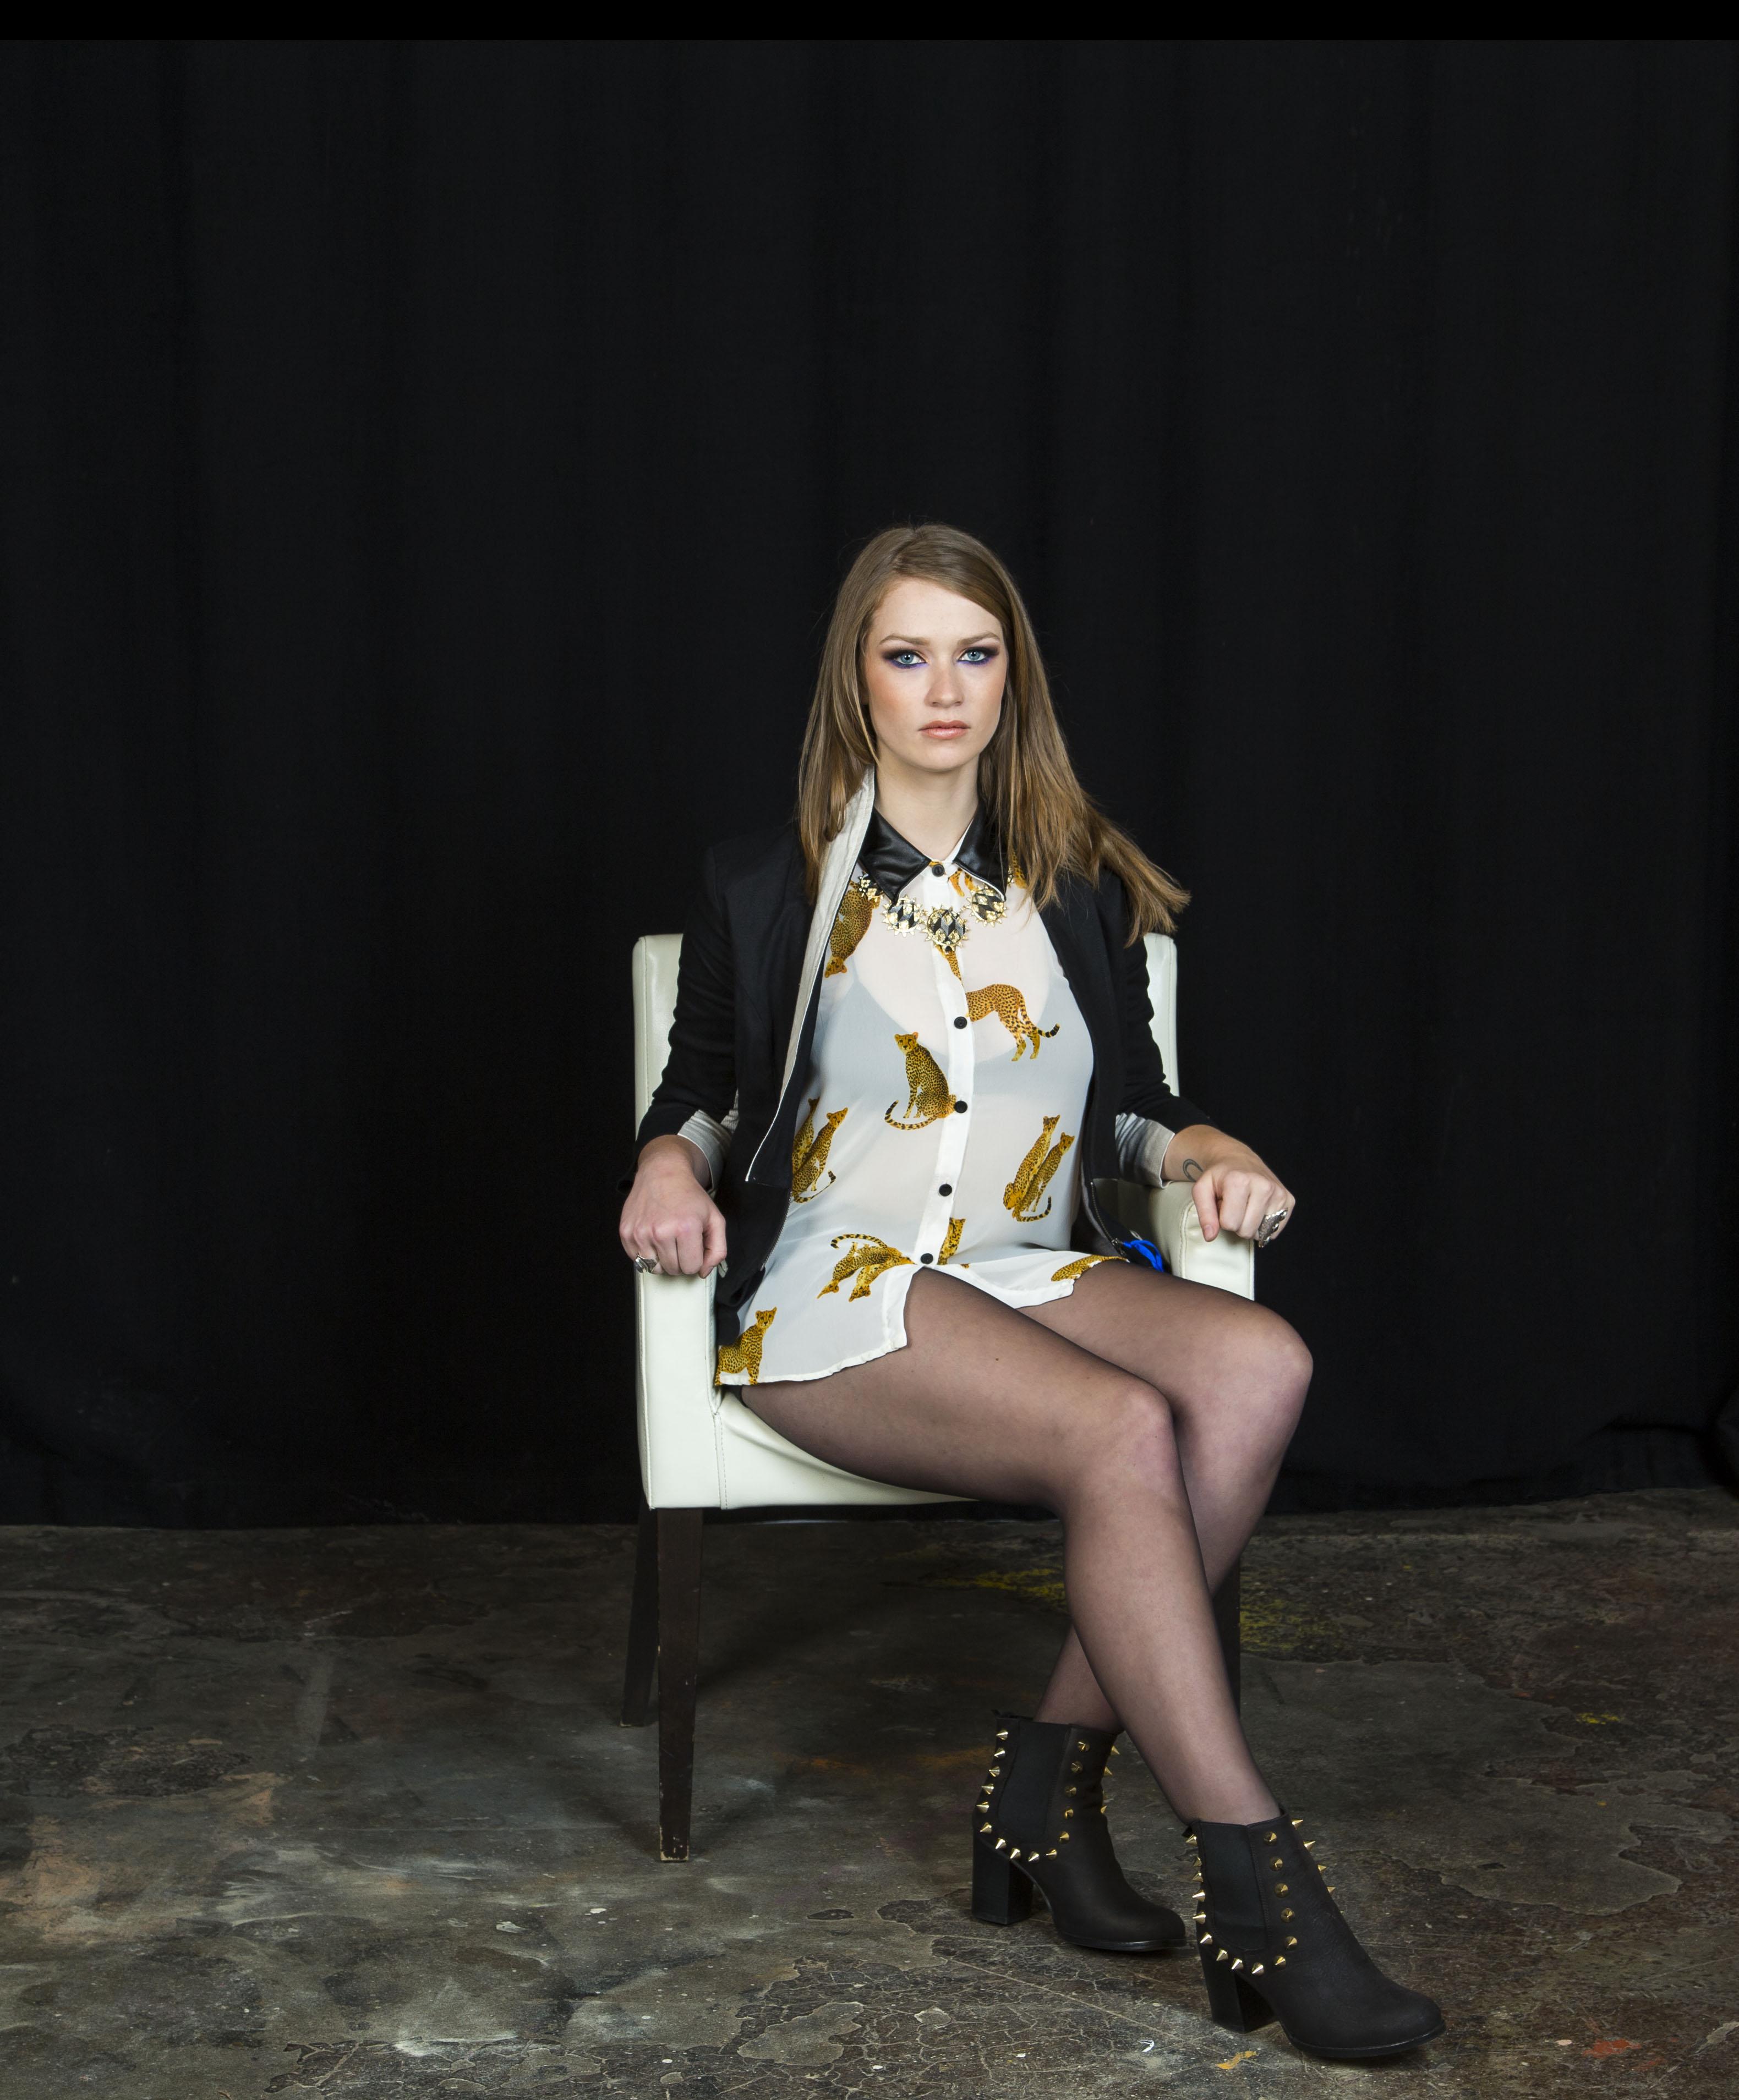 Whitney Lyman - Styled by Zebraclub